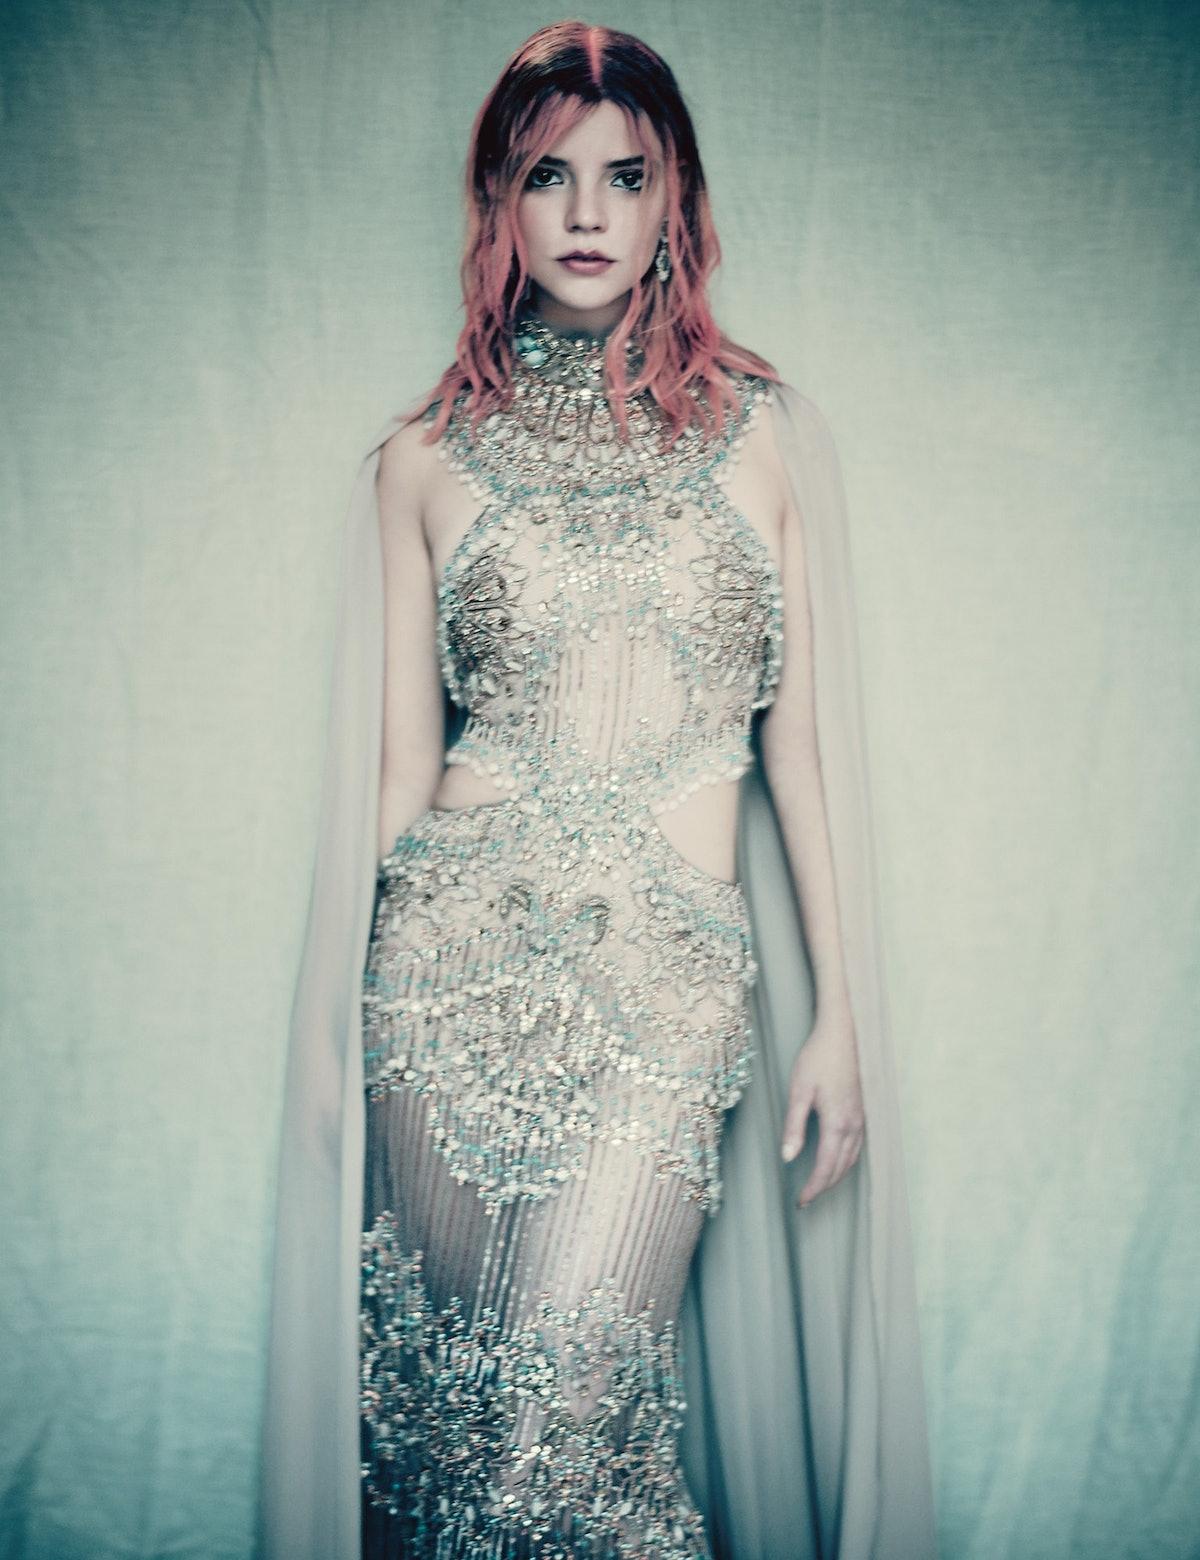 0417.w.PR.couture.image8.jpg